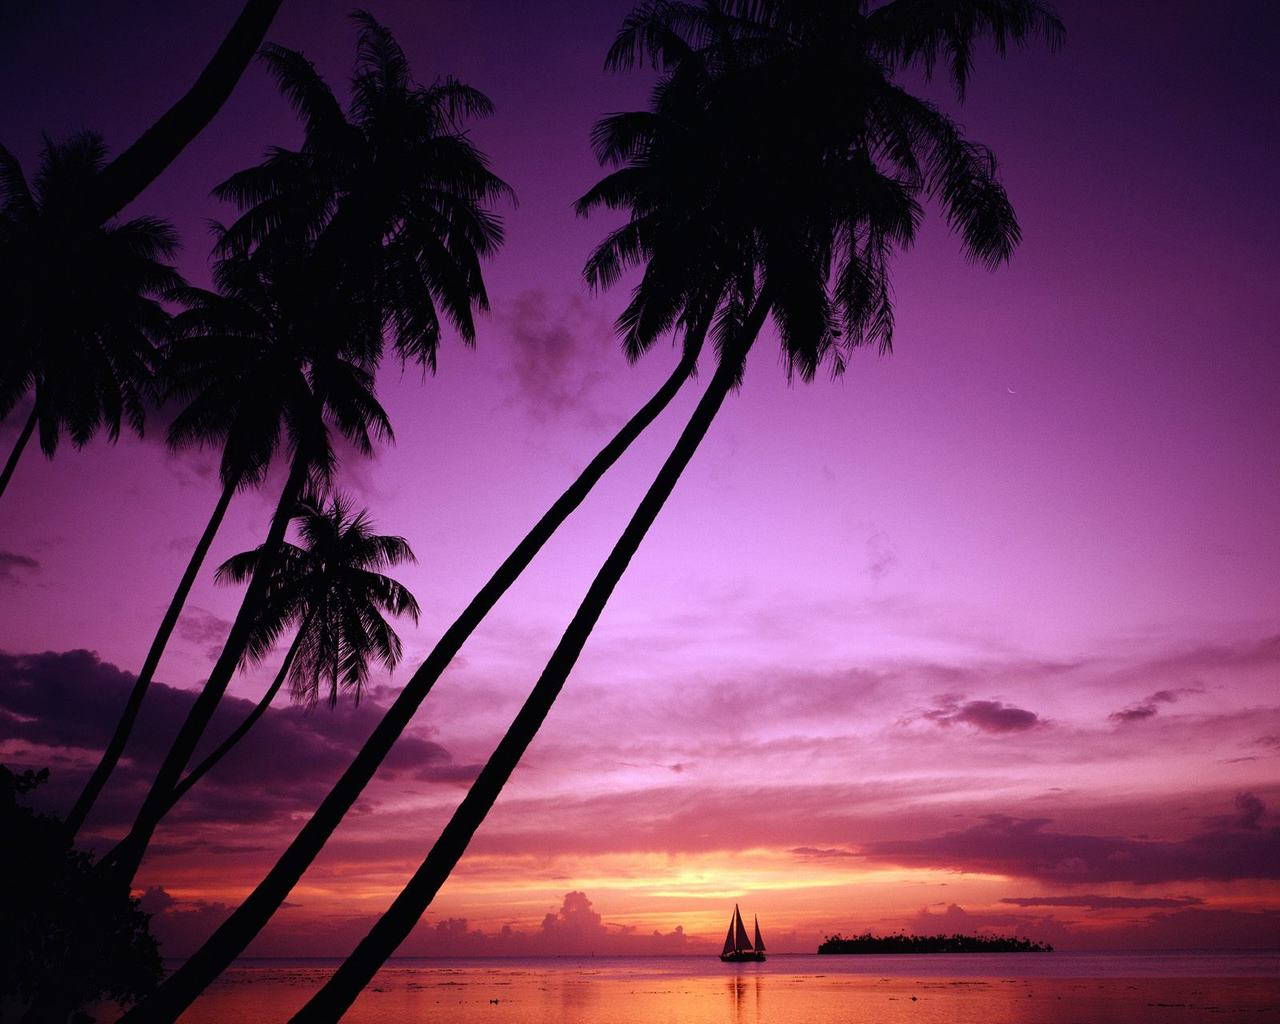 tropical island beach scenery amazing sunset desktop wallpaper 1280x1024